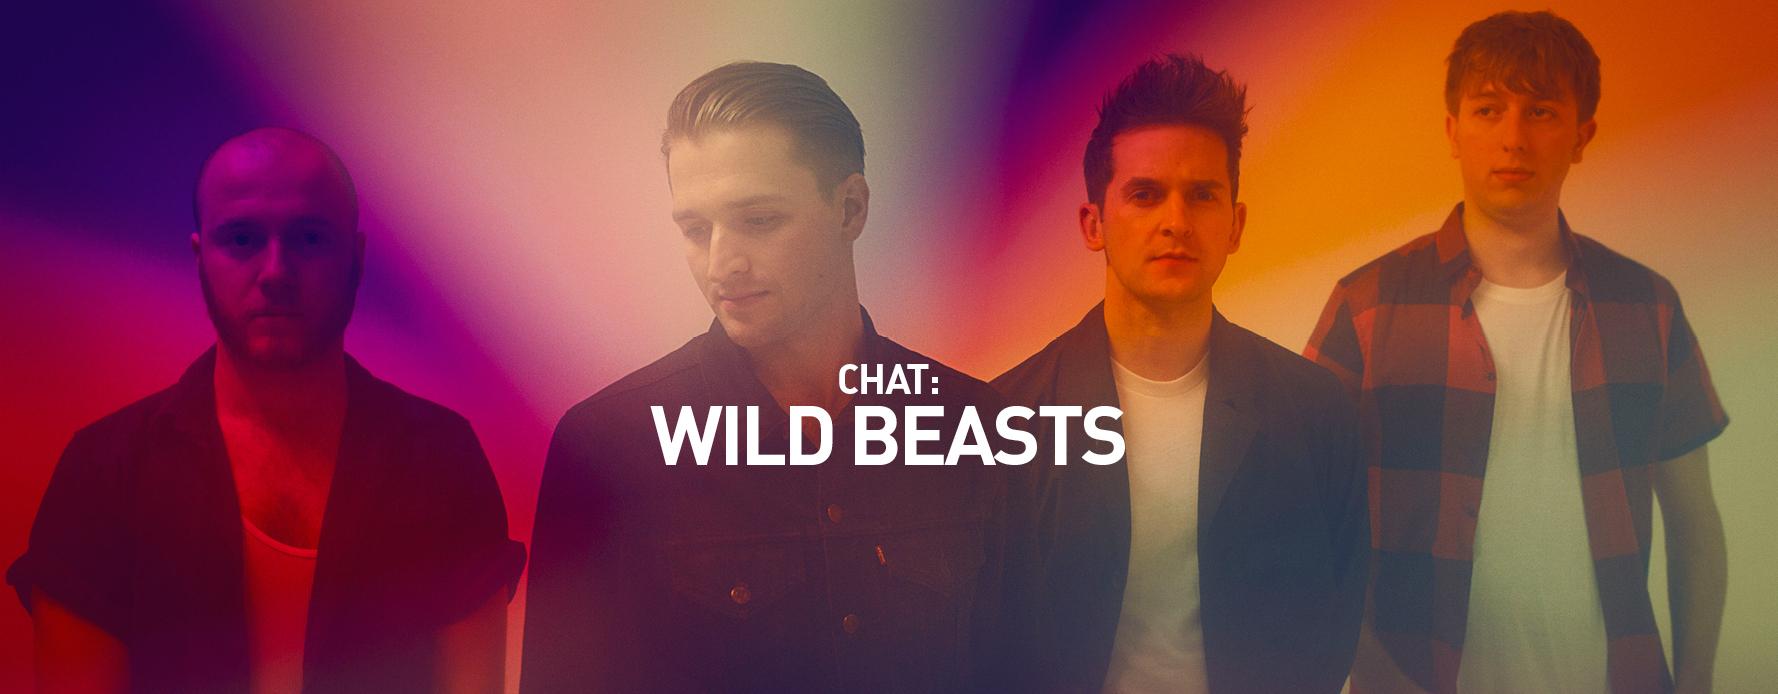 source: Wild Beasts